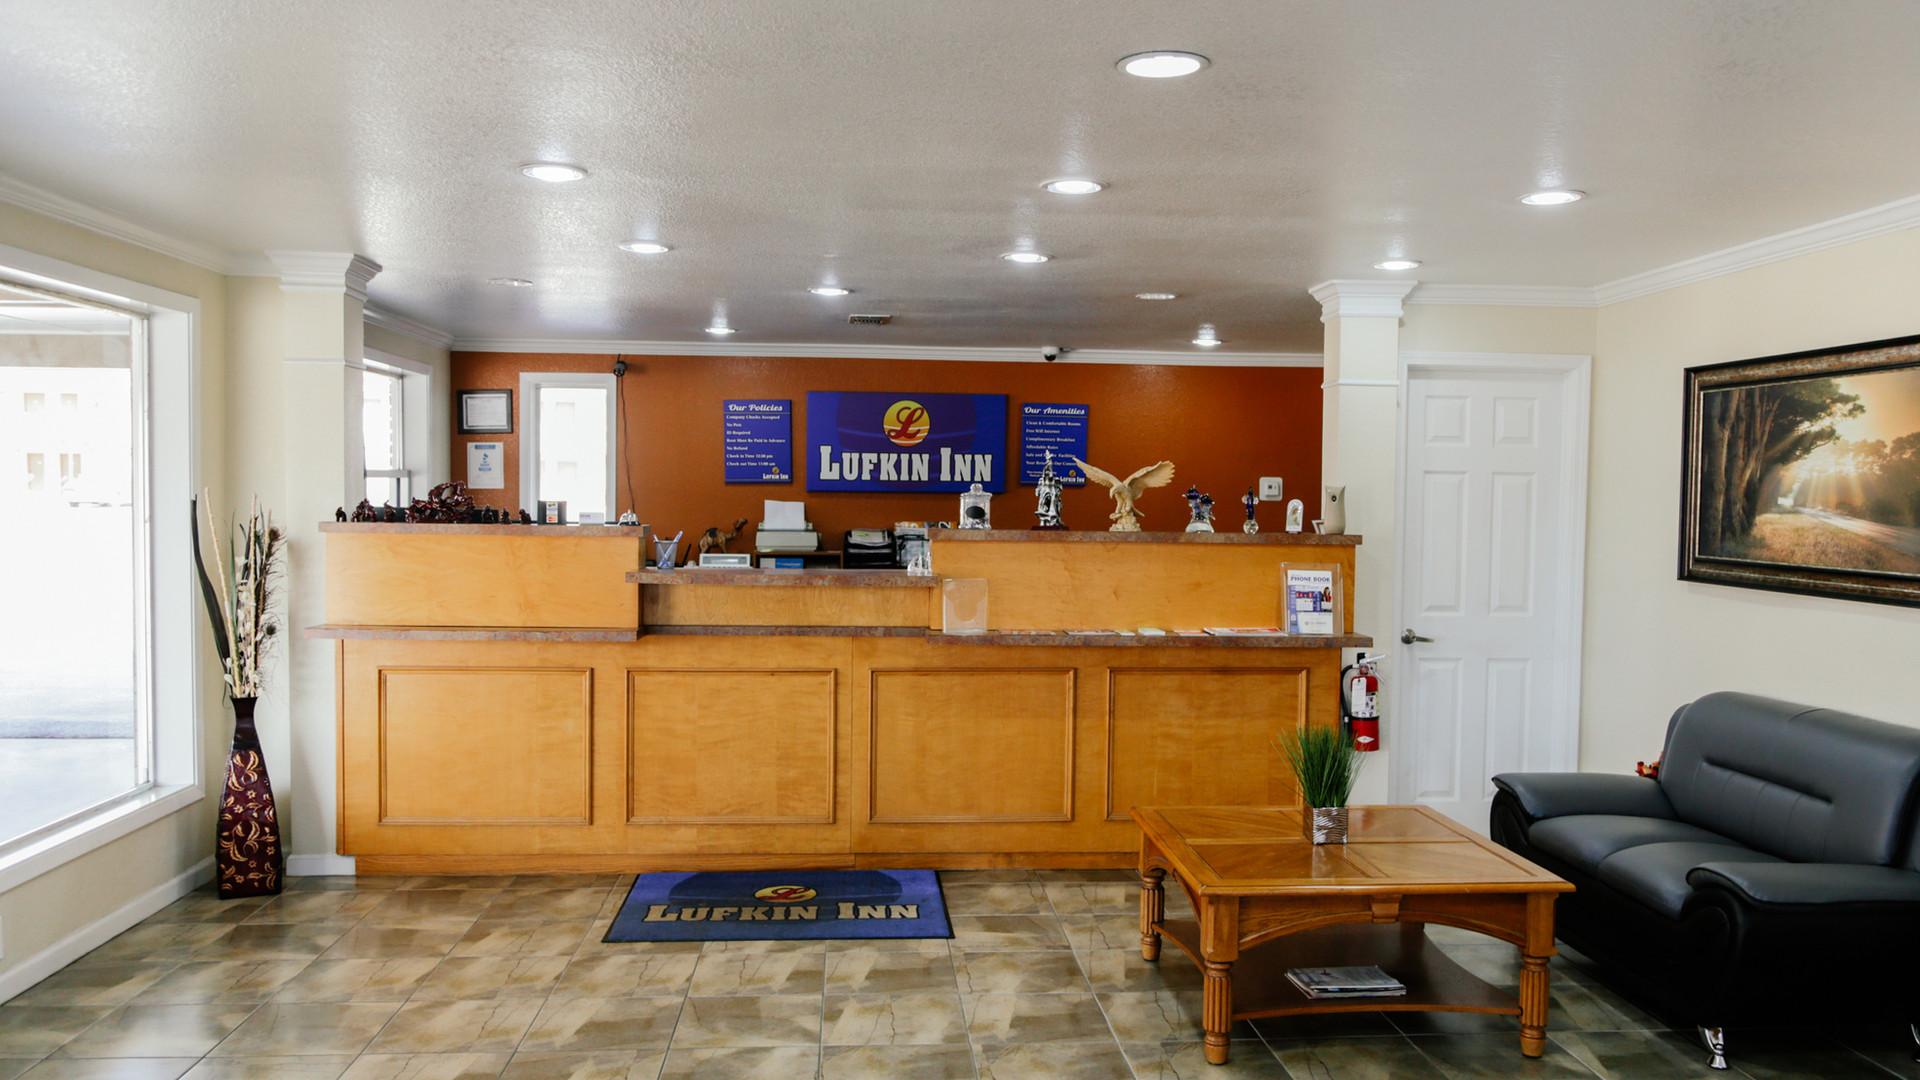 Lufkin Inn Room Photos-29.jpg